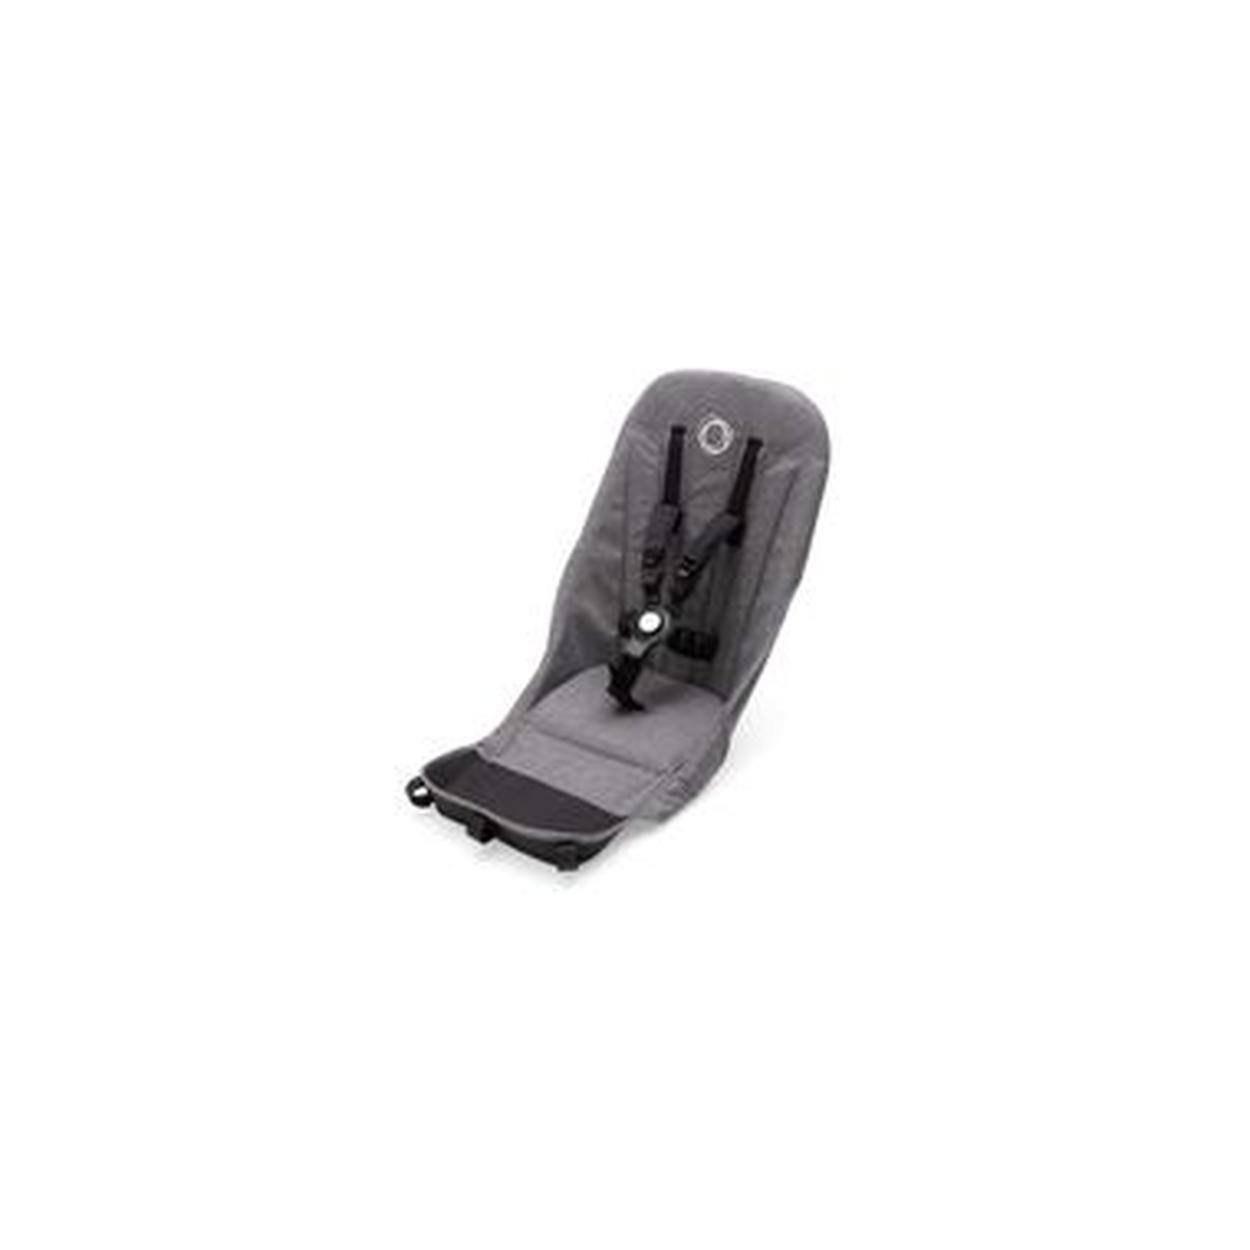 2 base seat fabrics